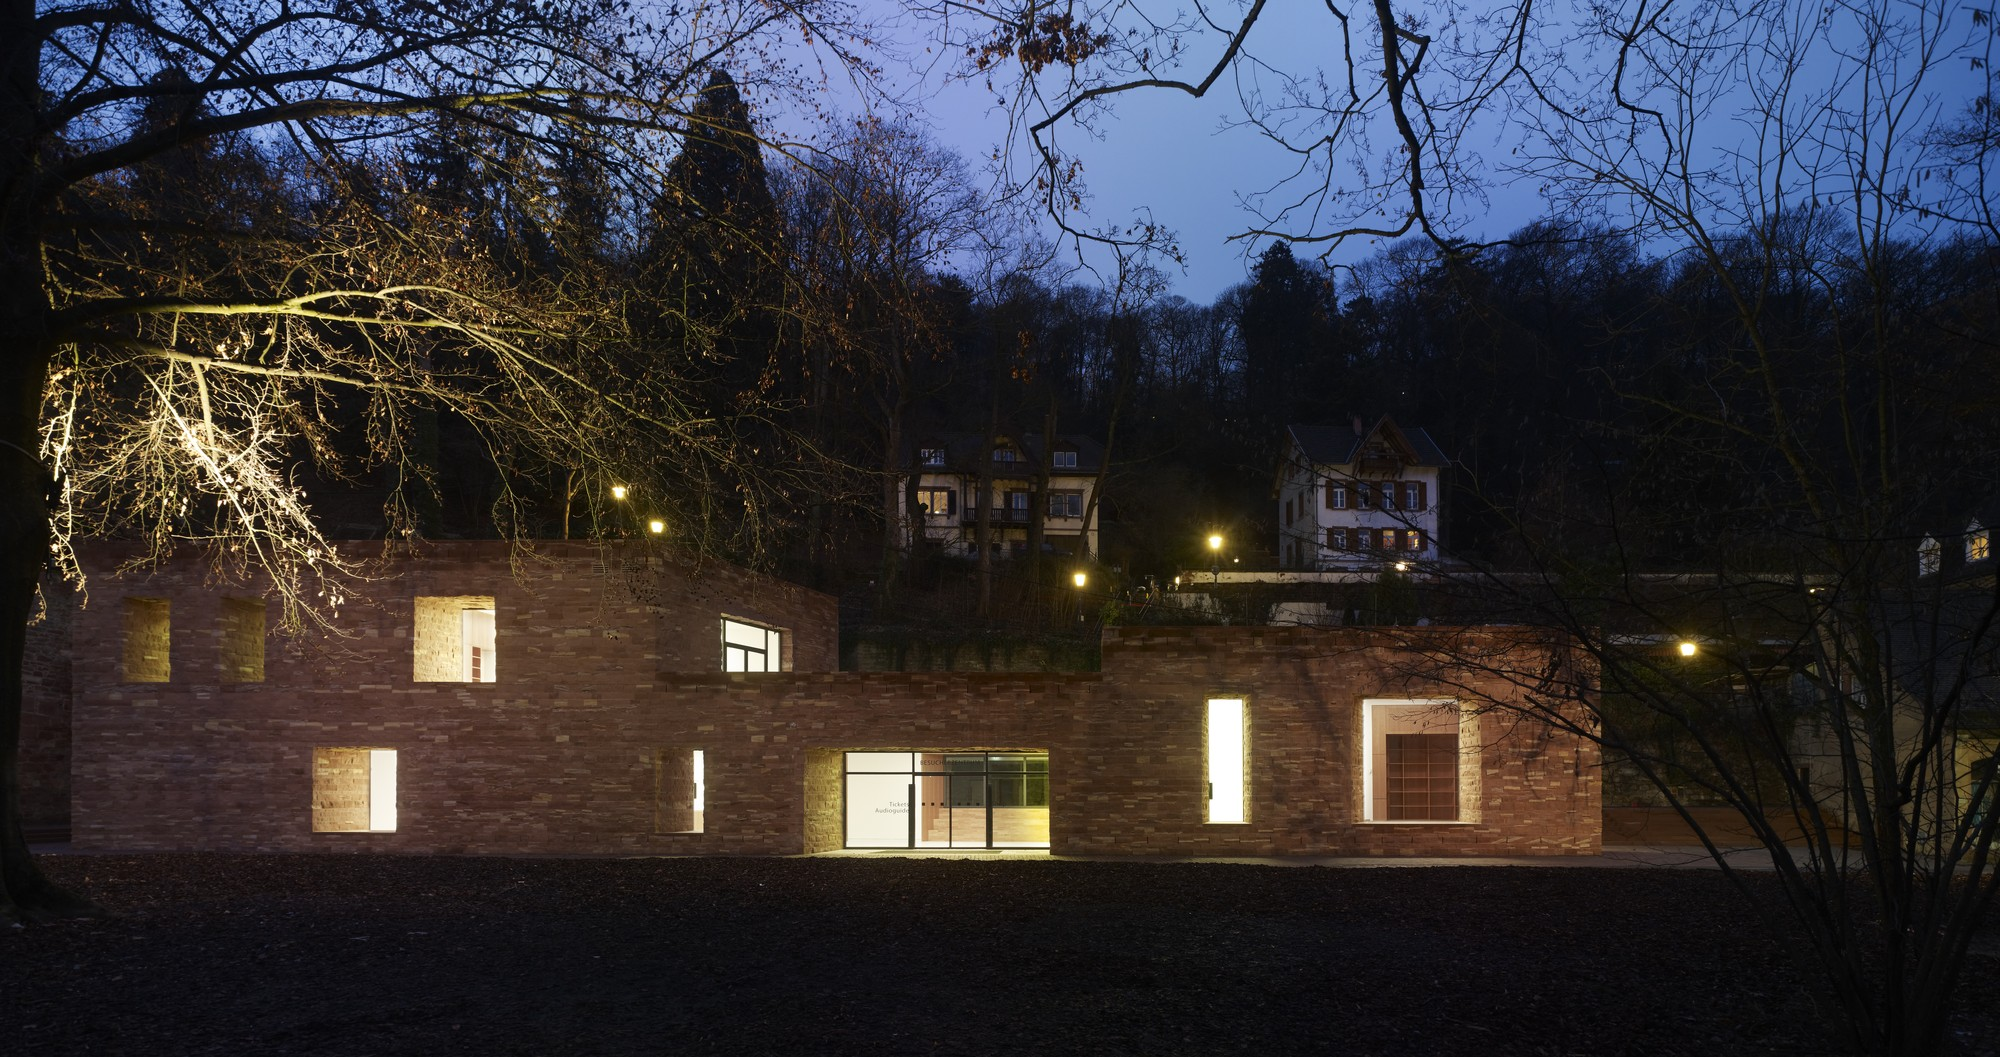 Architekt Heidelberg gallery of heidelberg castle max dudler architekt 1